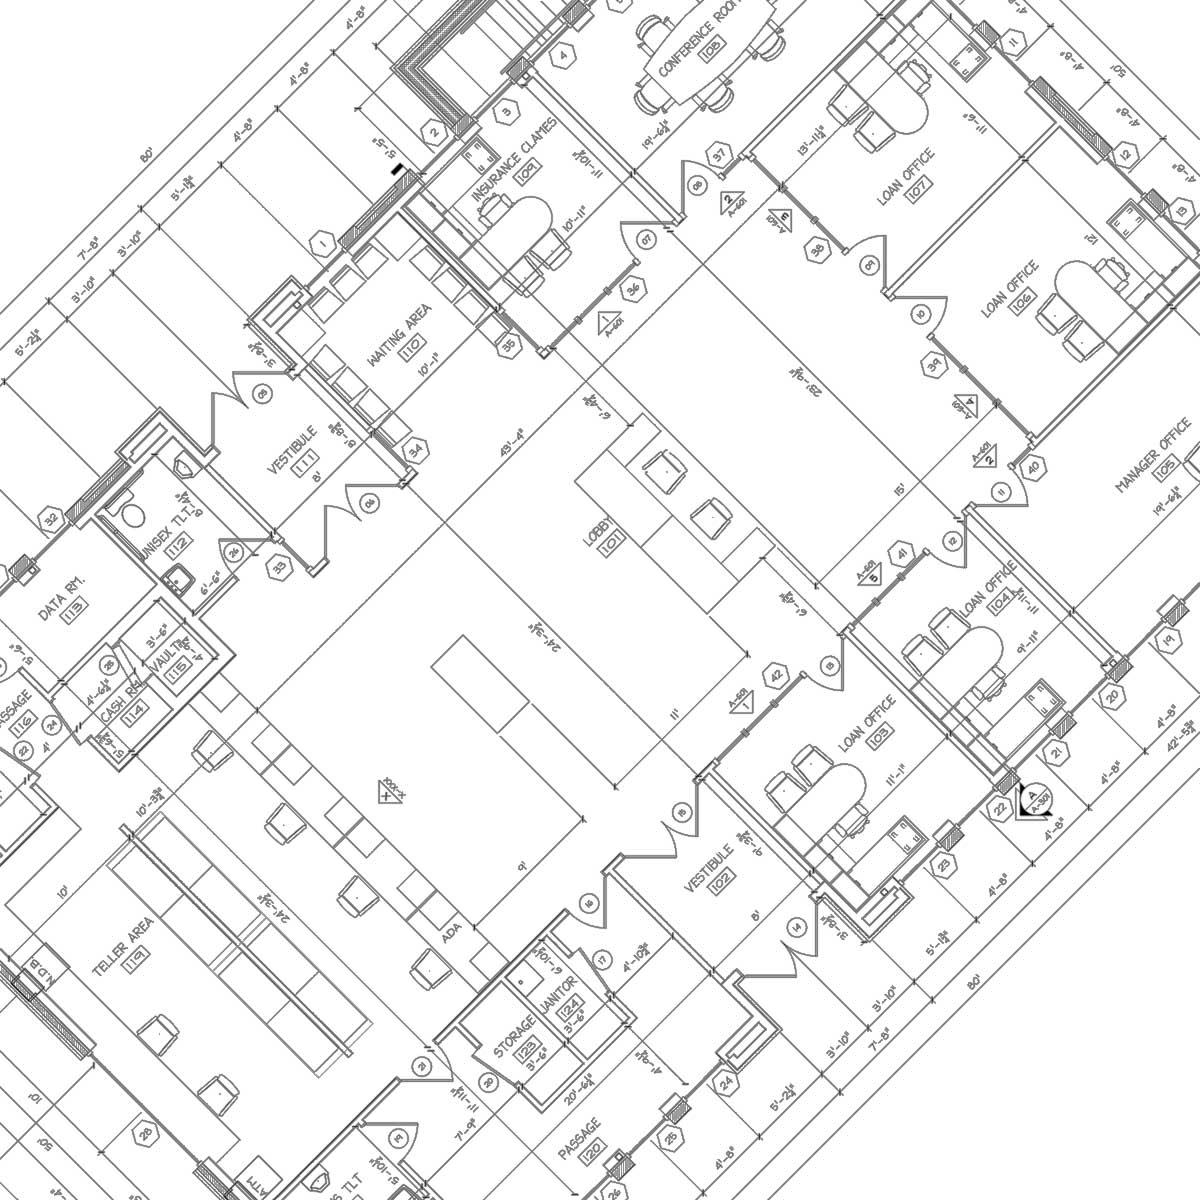 pump house design cj wallace engineering bradford pa Lift Station Schematic